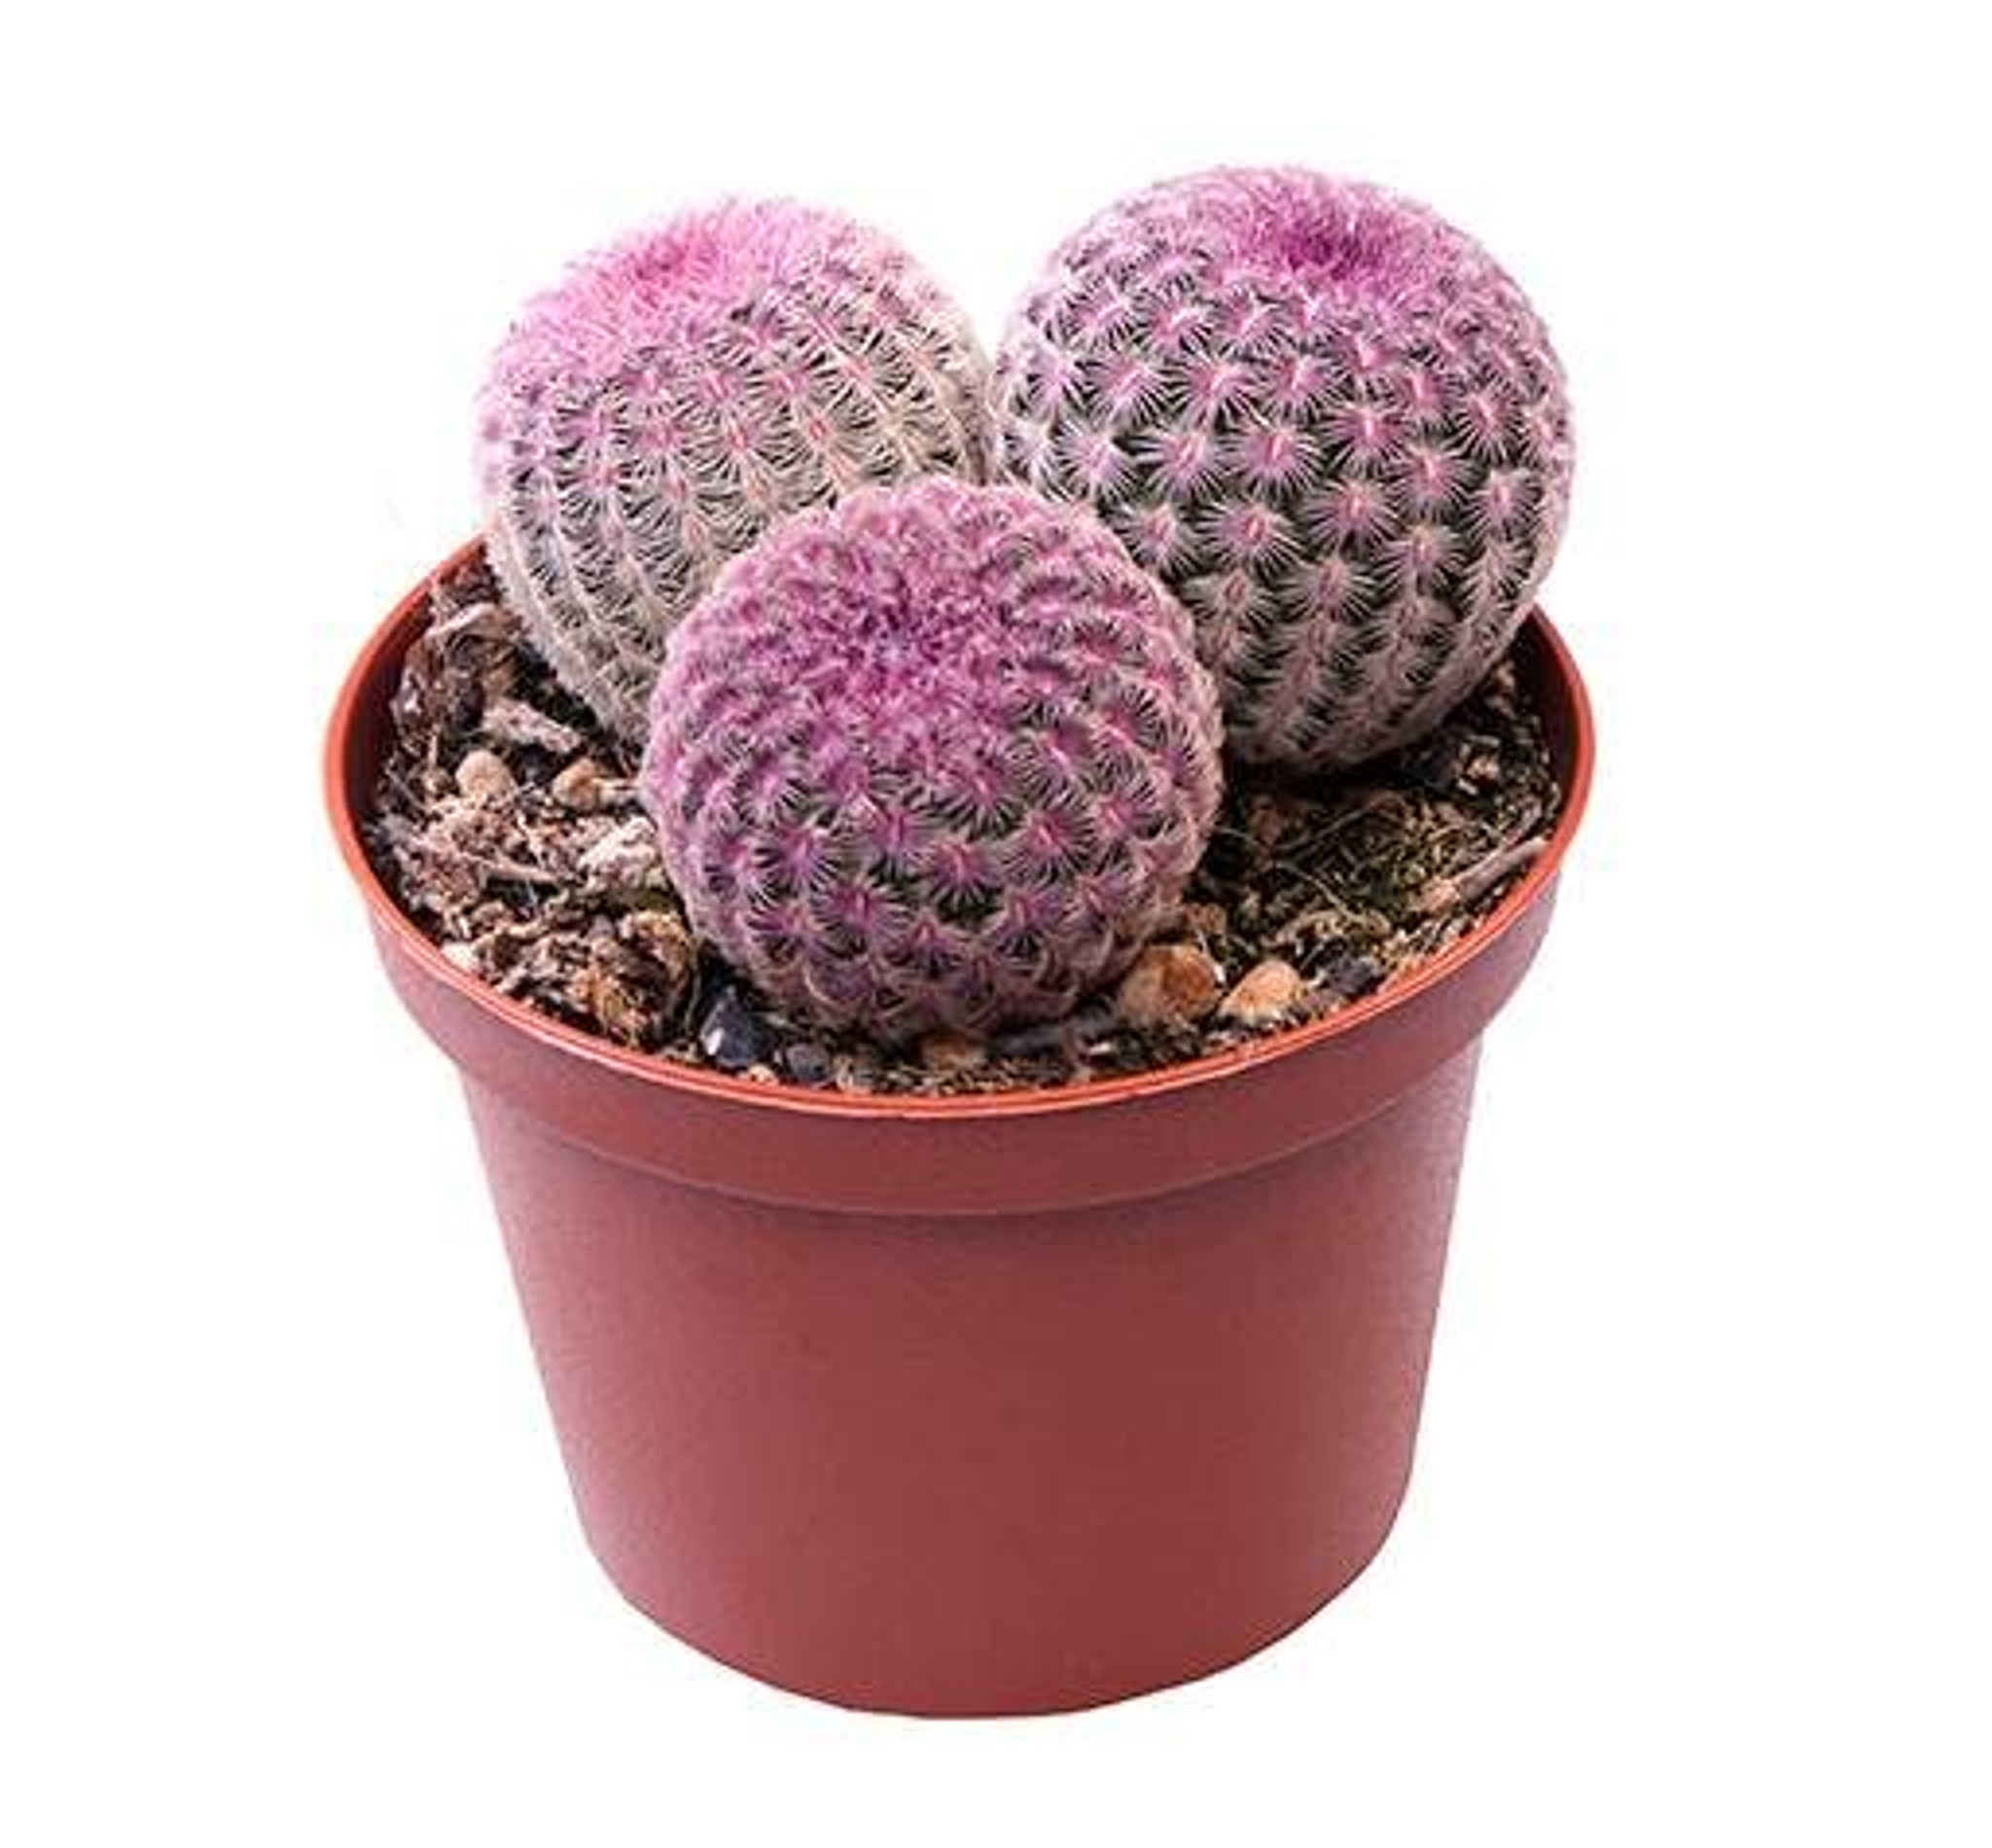 3 in 1 Lace Cactus